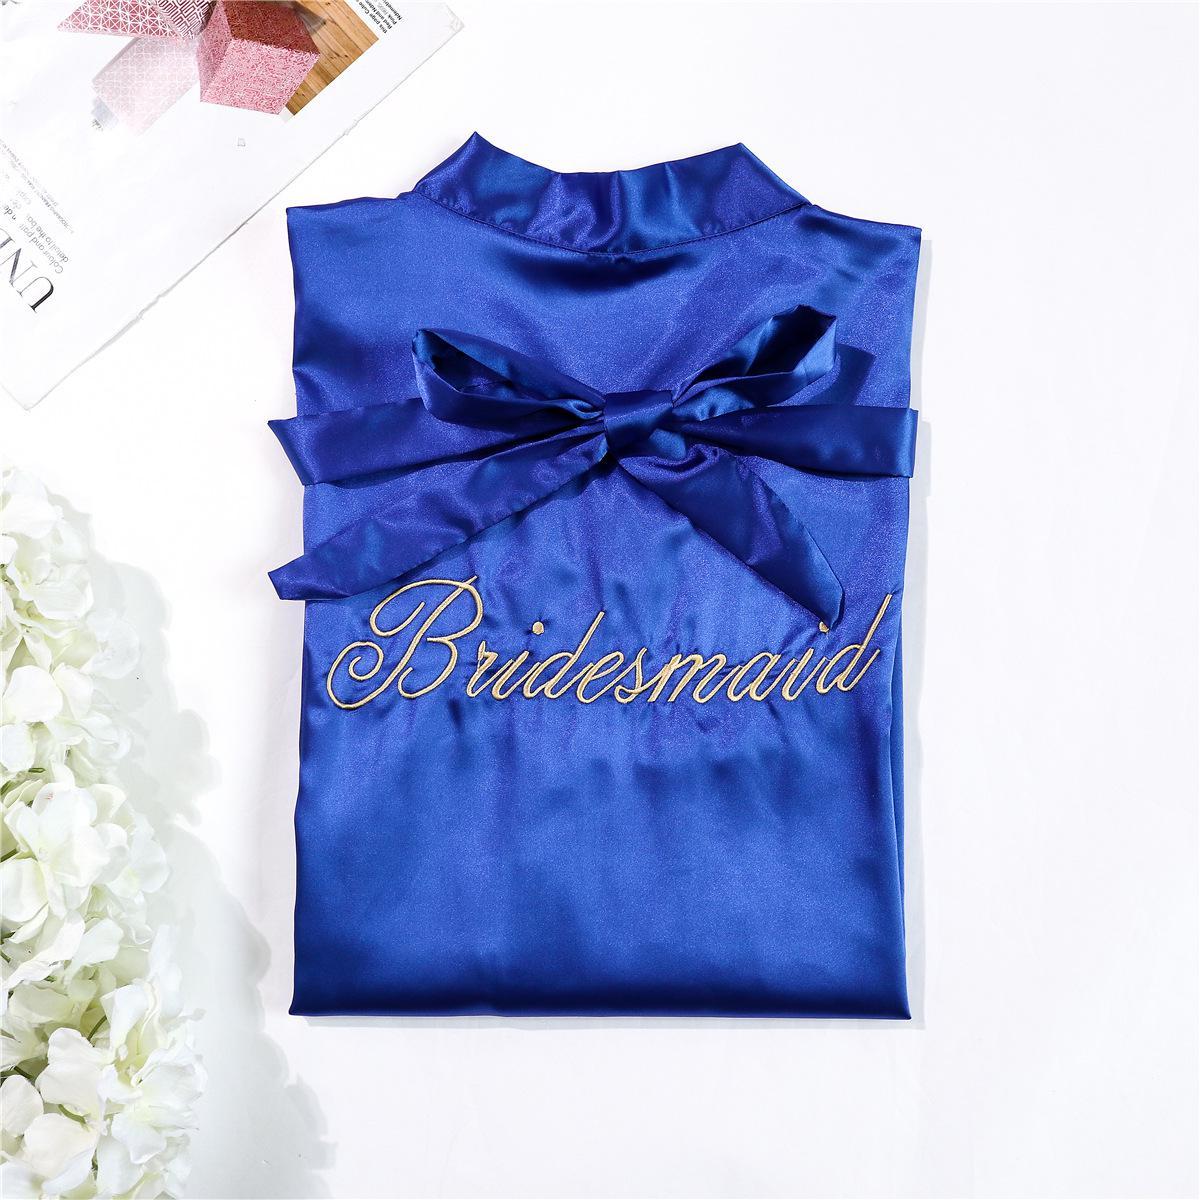 Bridesmaid - 1